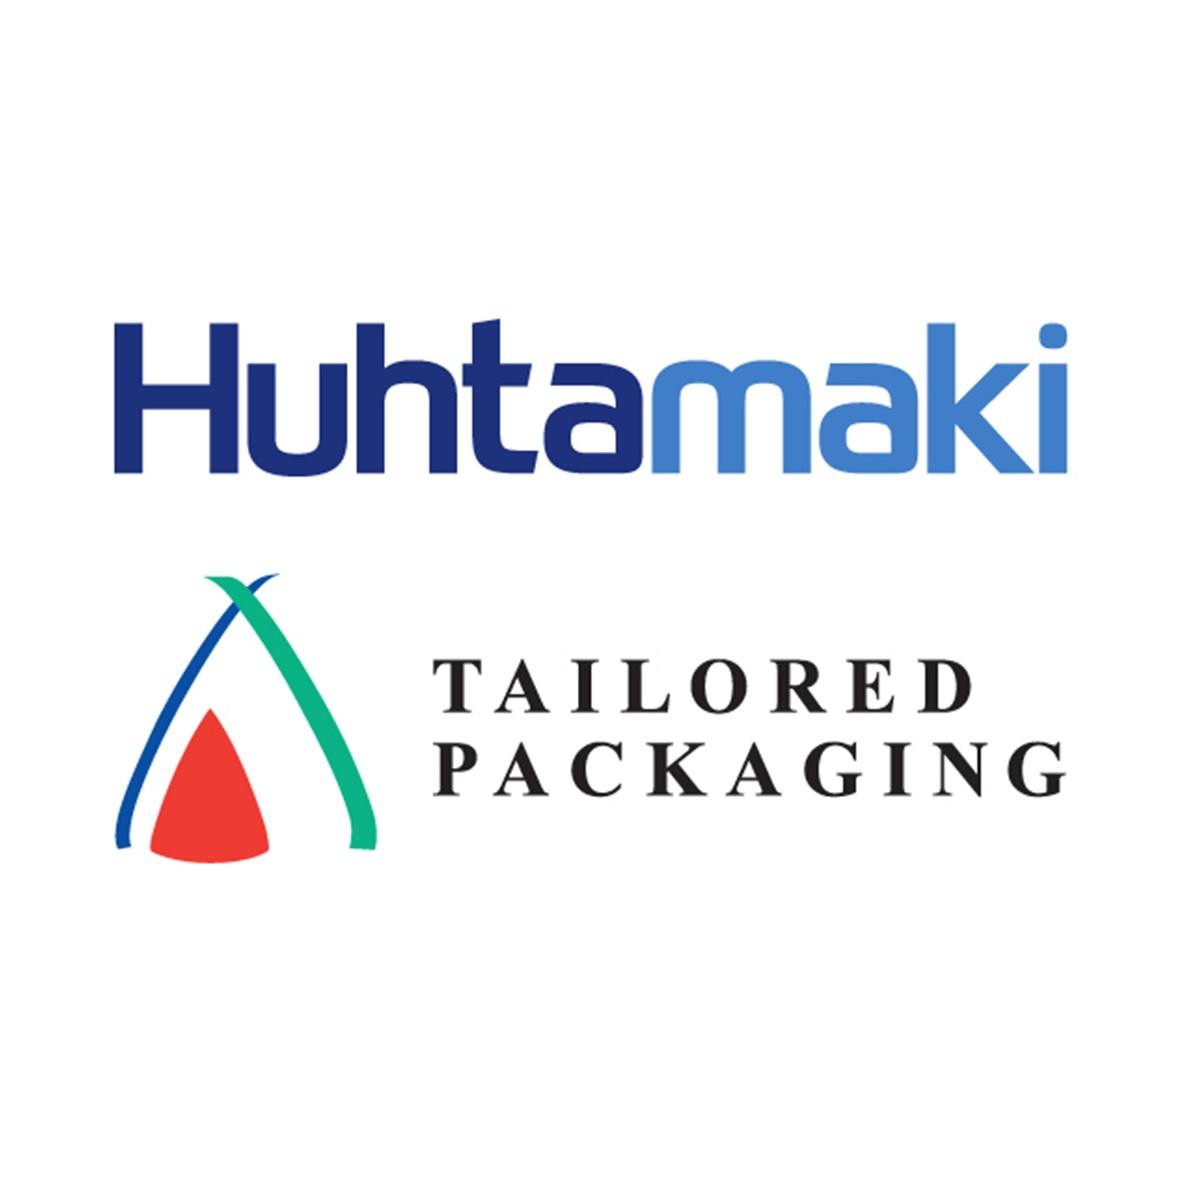 Huhtamaki Tailored Packaging